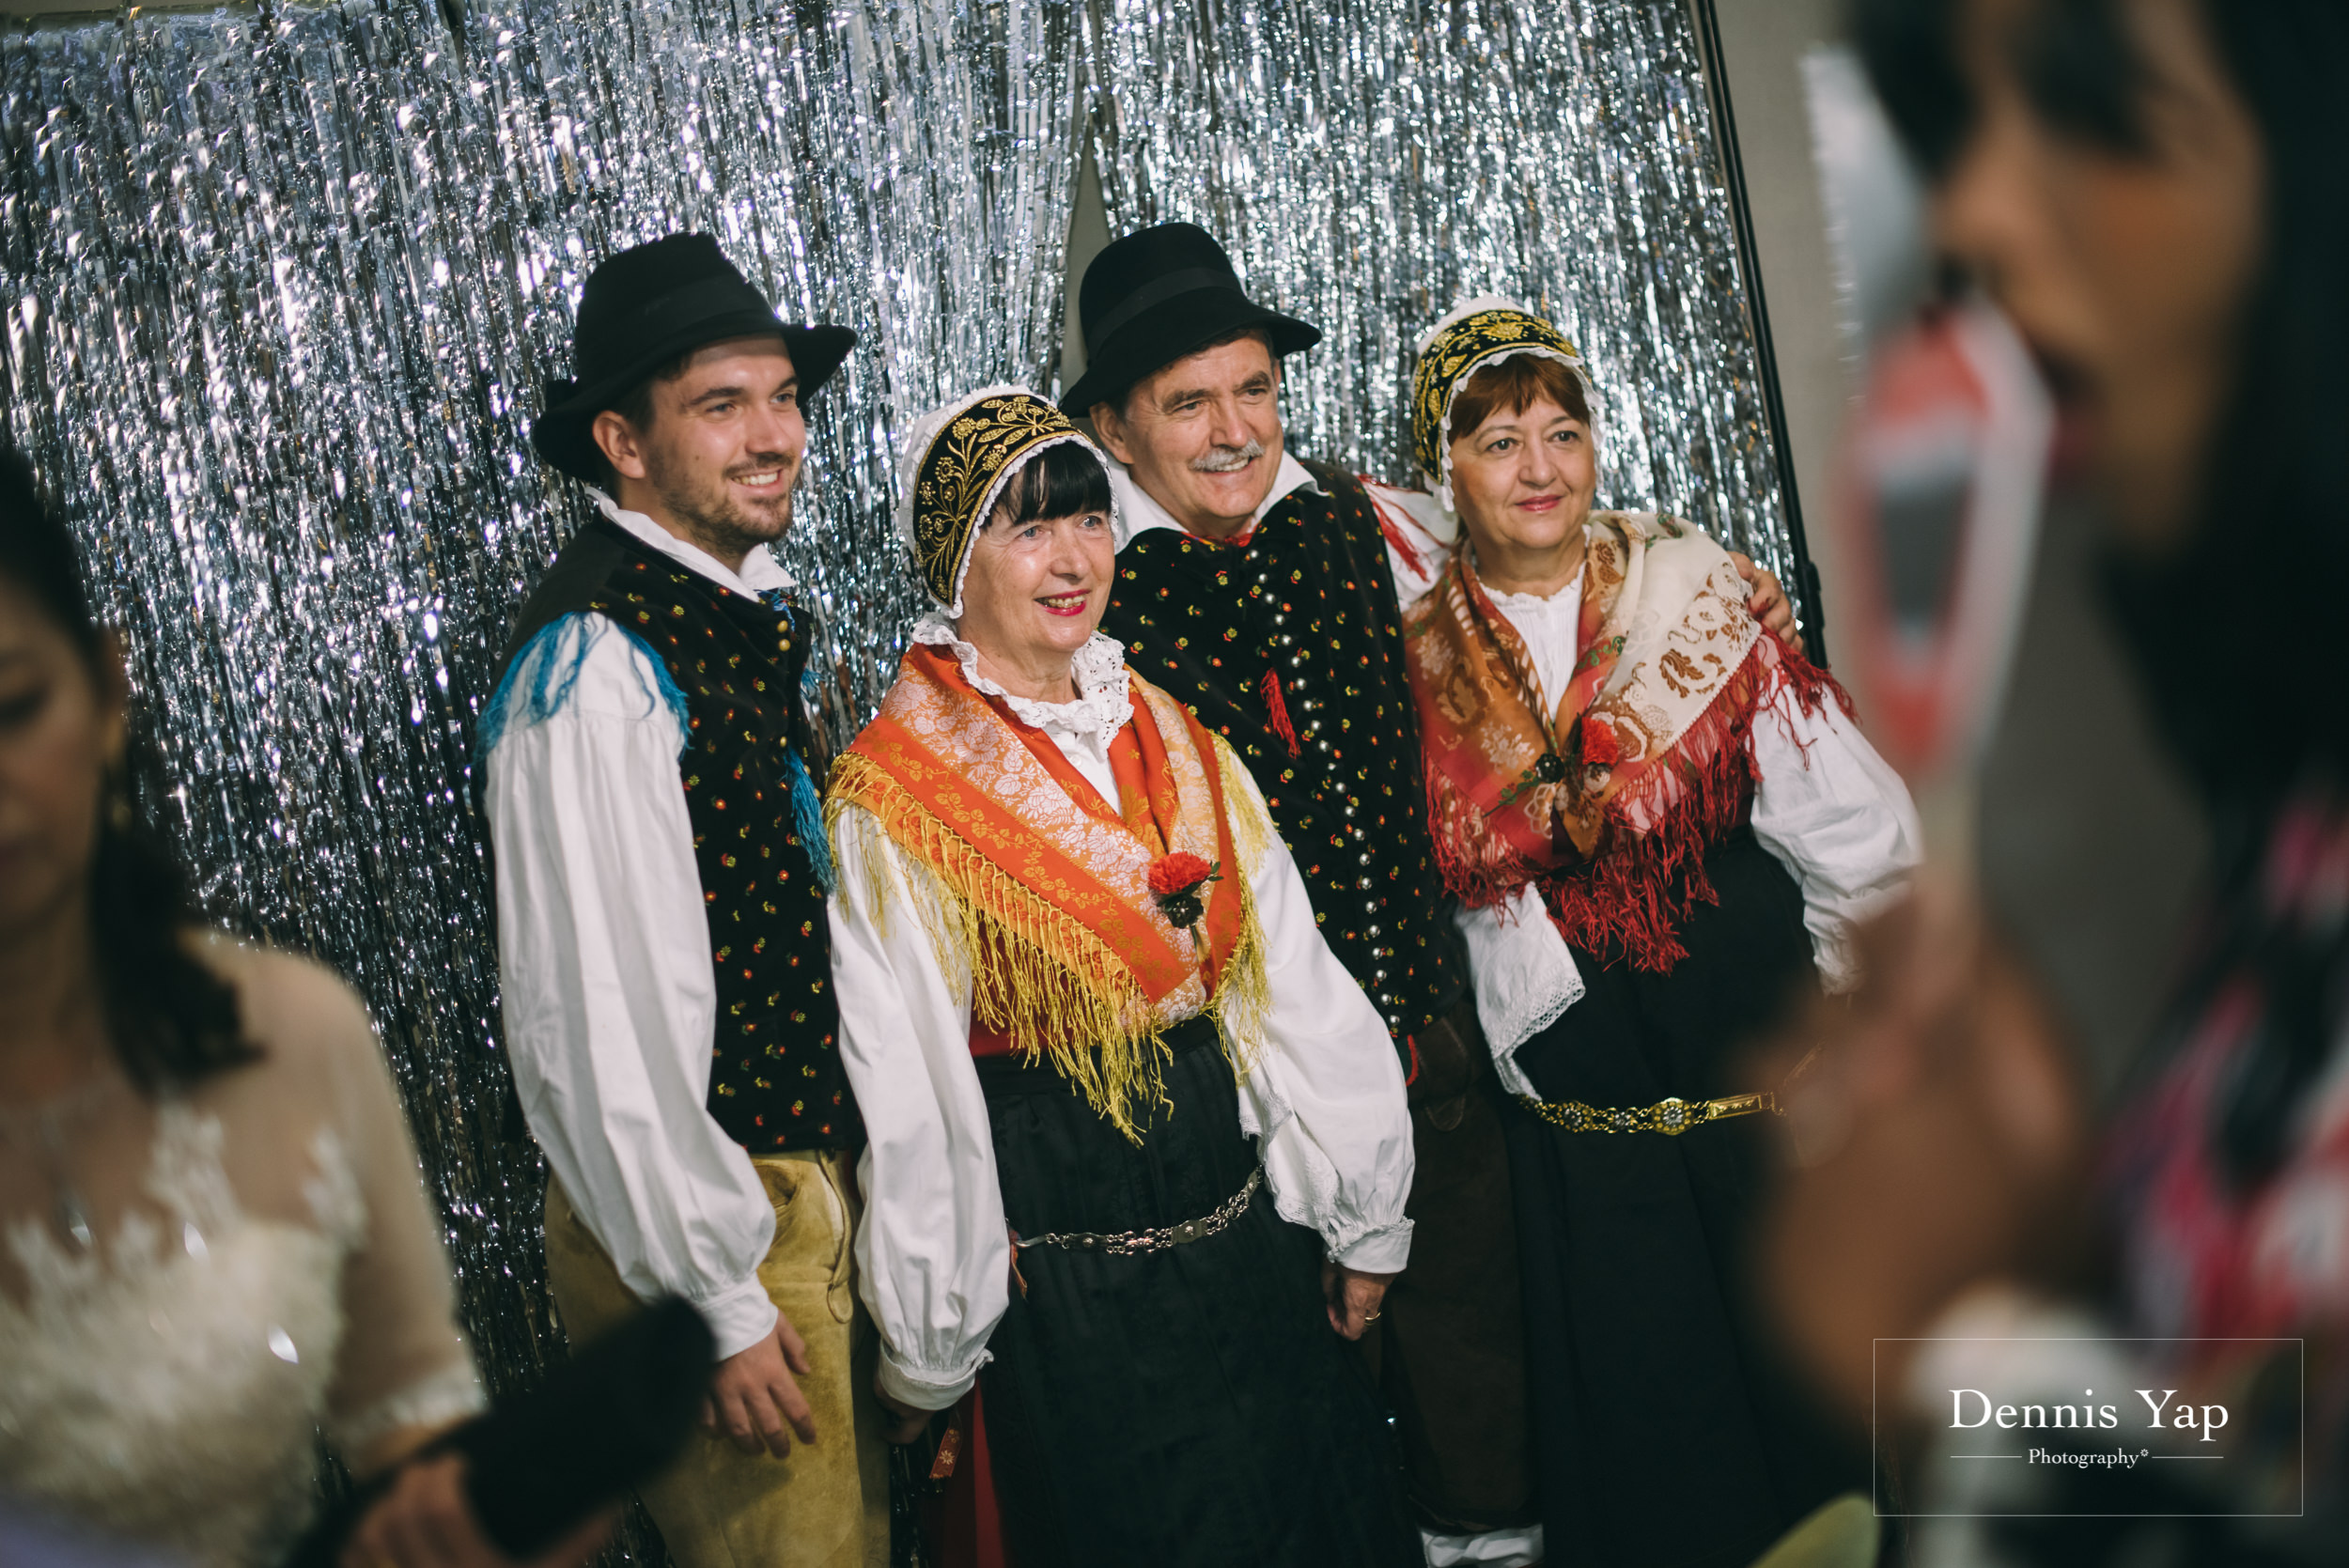 nejd leena slovenian wedding reception malaysia wedding photographer dennis yap premier hotel klang-2.jpg